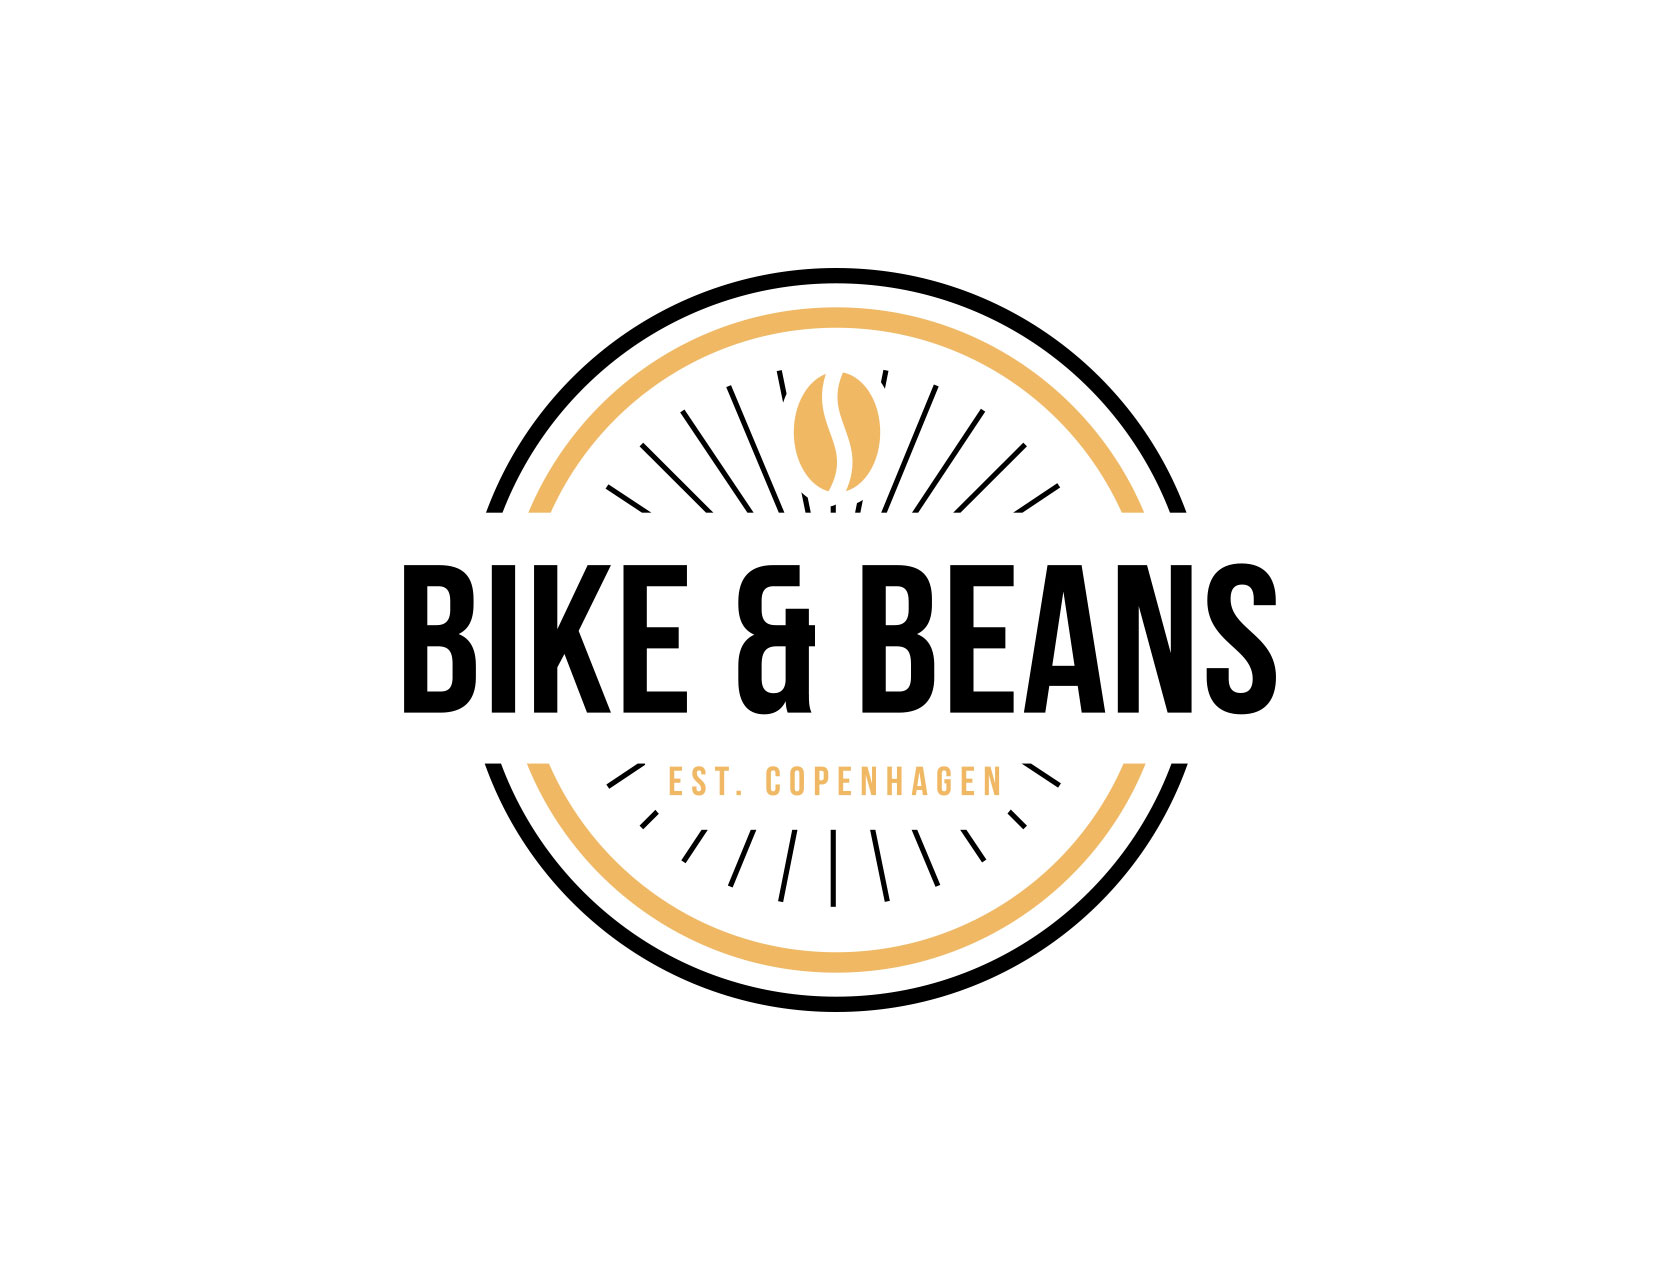 Bike & Beans logo